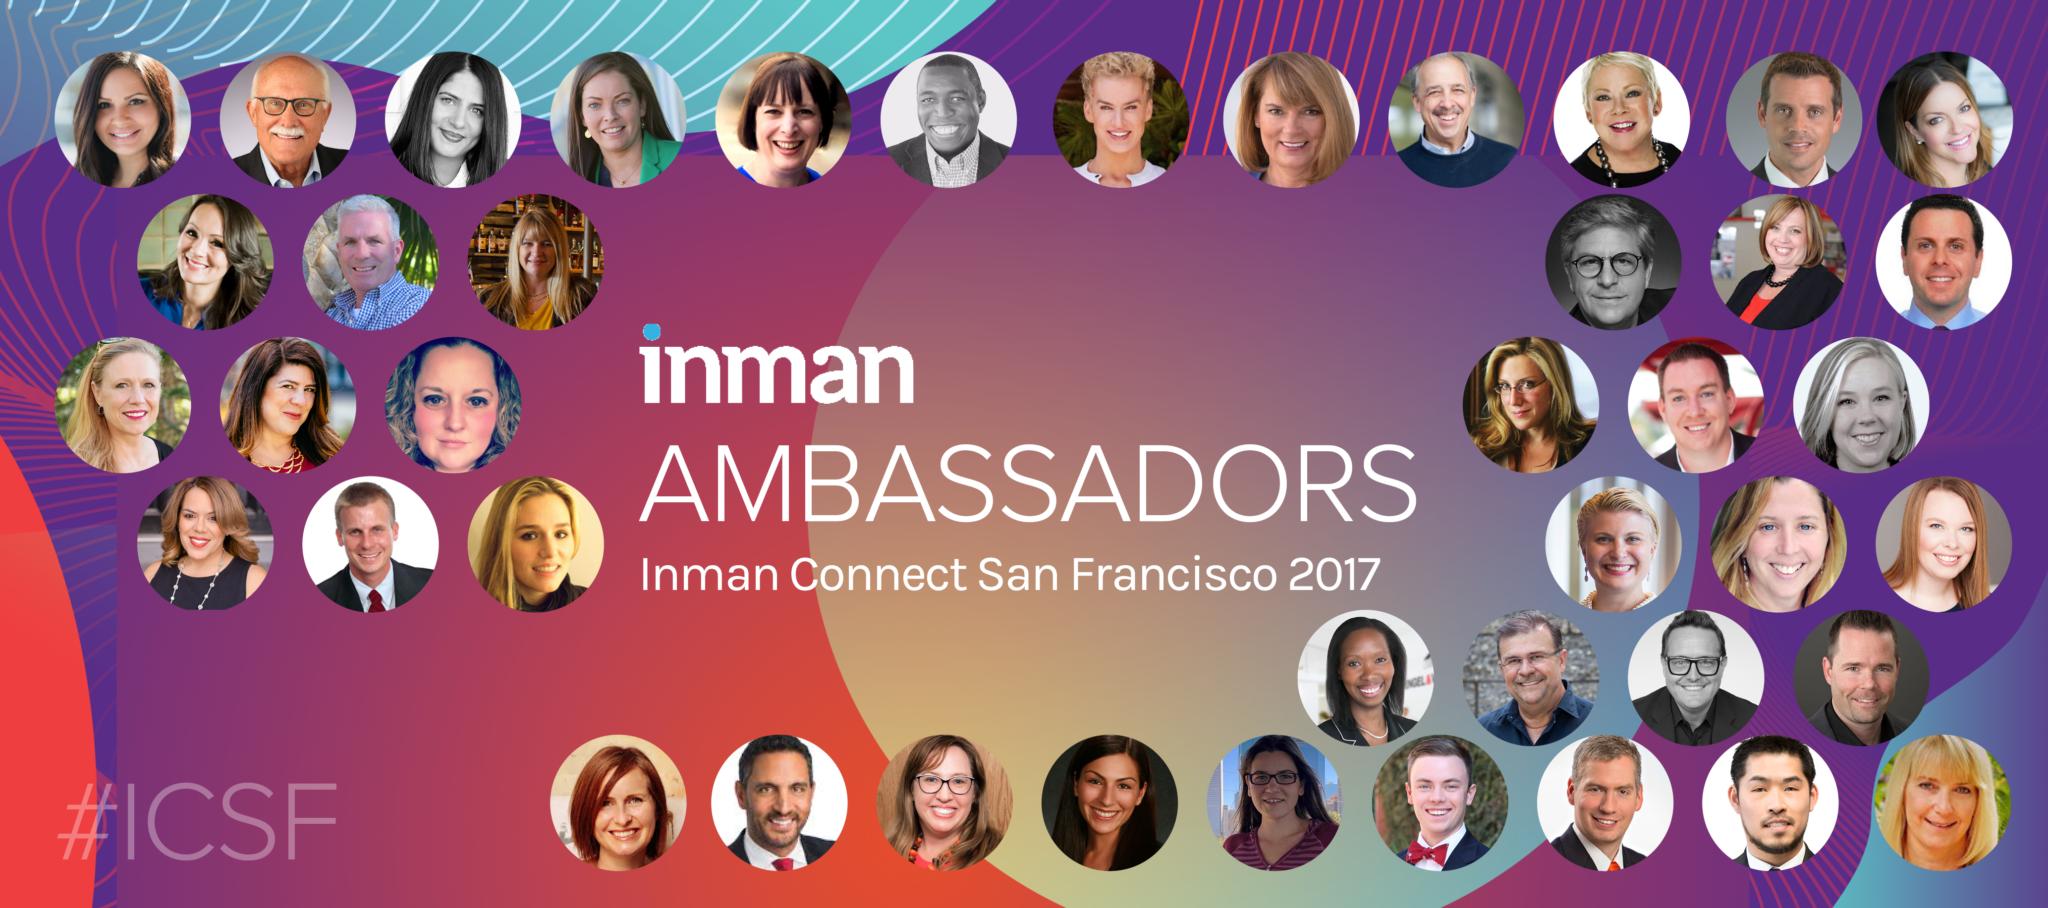 Inman Ambassadors ICSF 2017